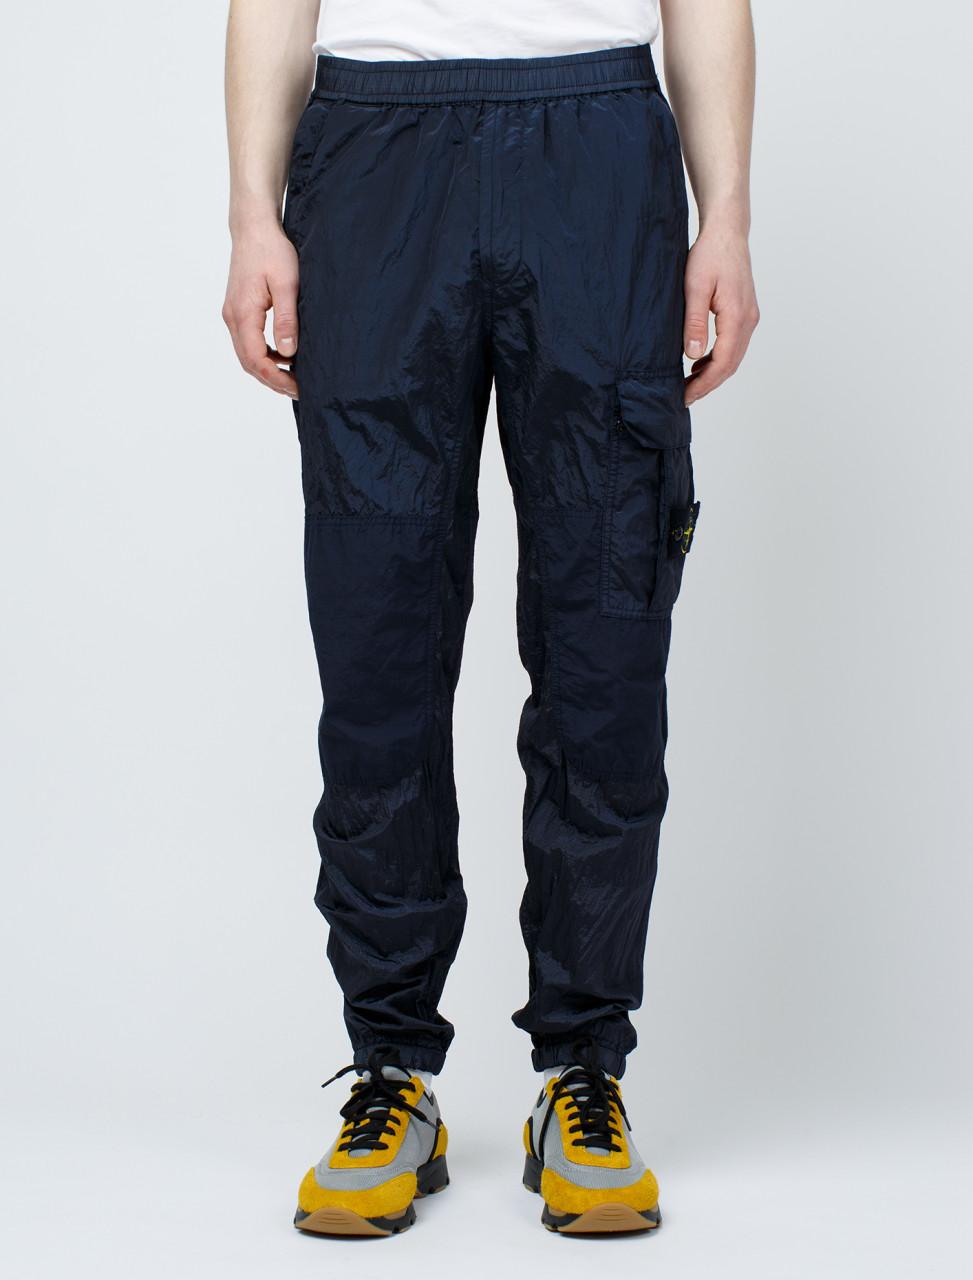 SI Navy Blue Track Pants